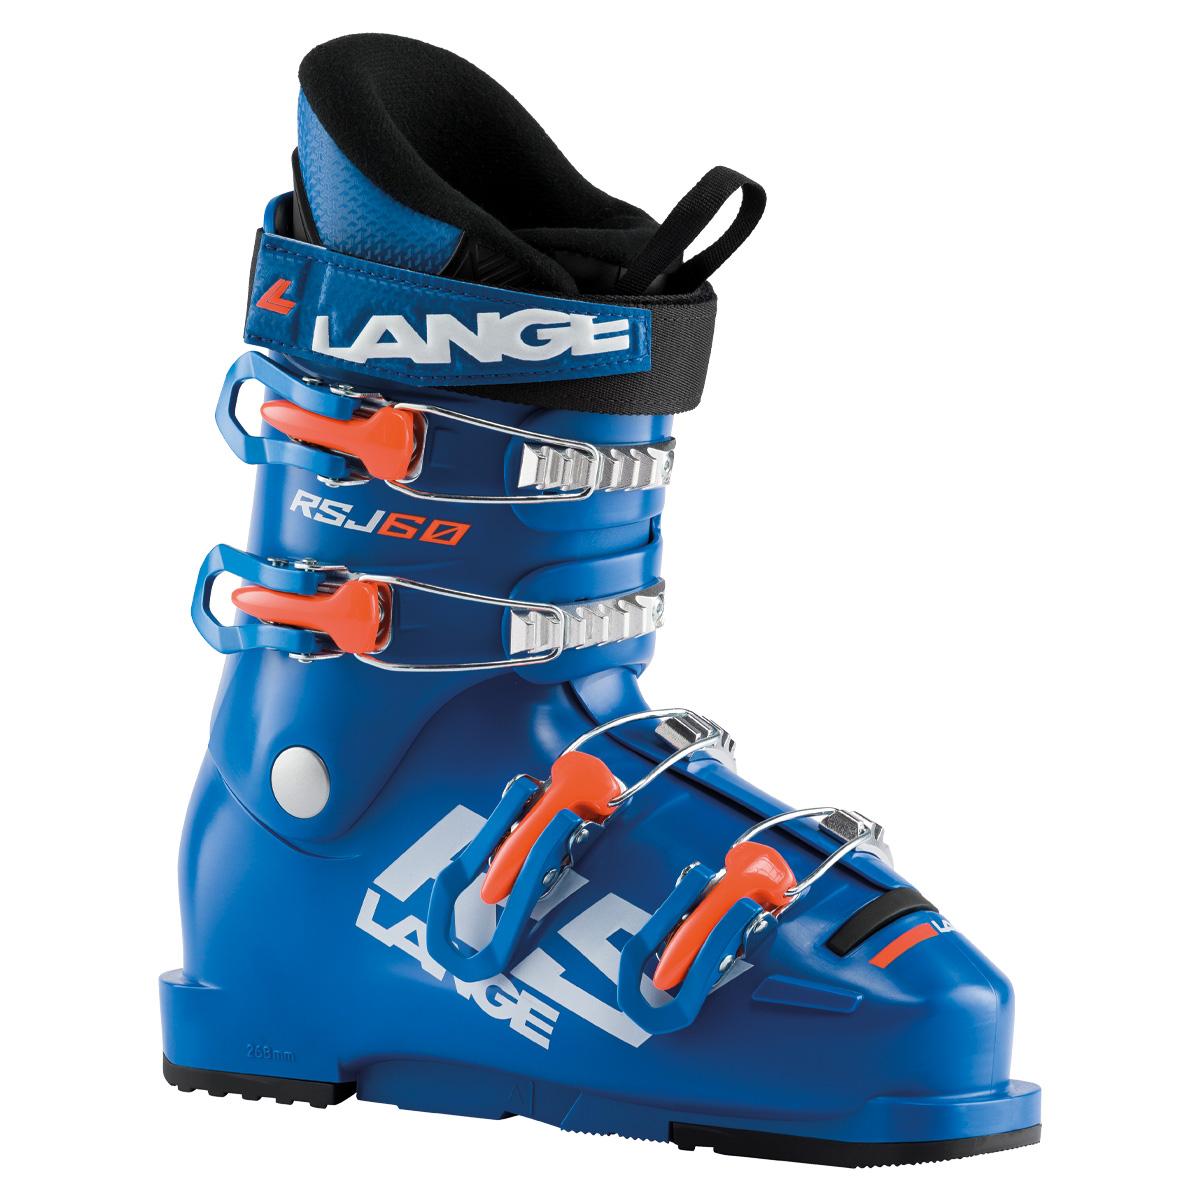 Scarponi Sci Lange RSJ 60 (Colore: Blu arancione, Taglia: 21.5)